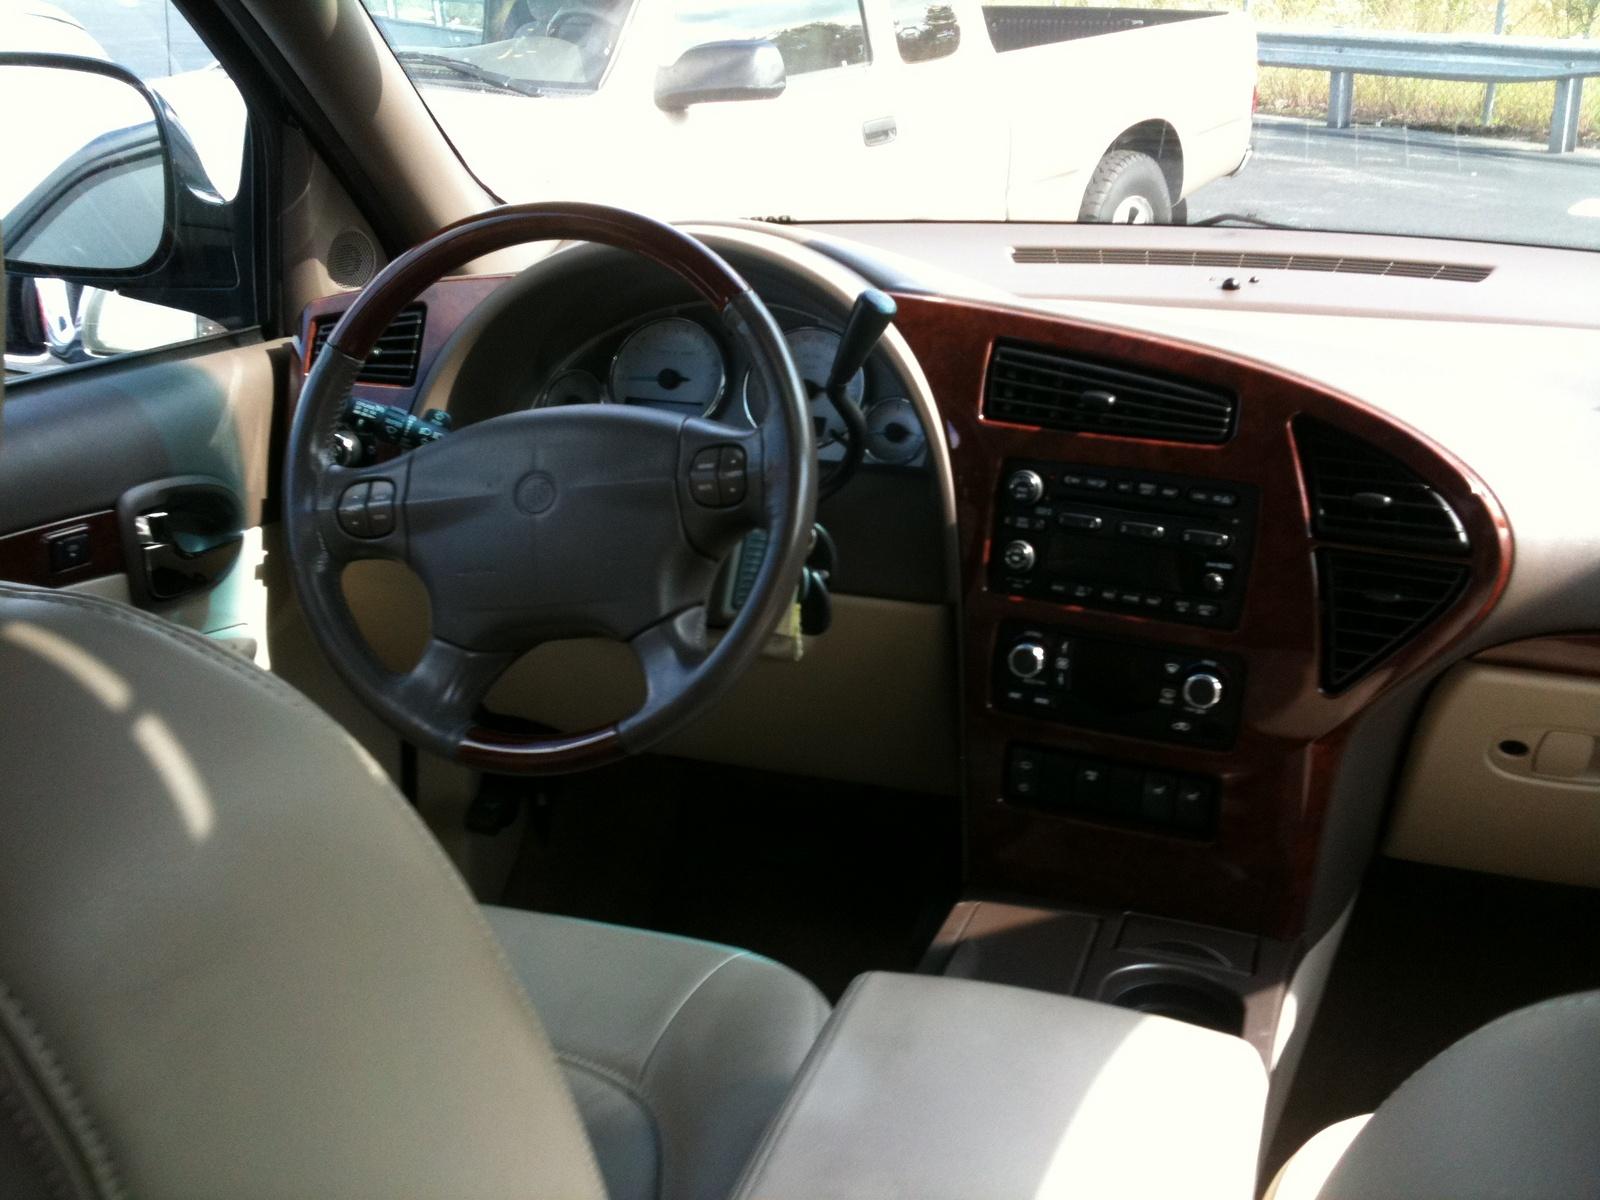 Buick Rendezvous Cxl Awd Pic